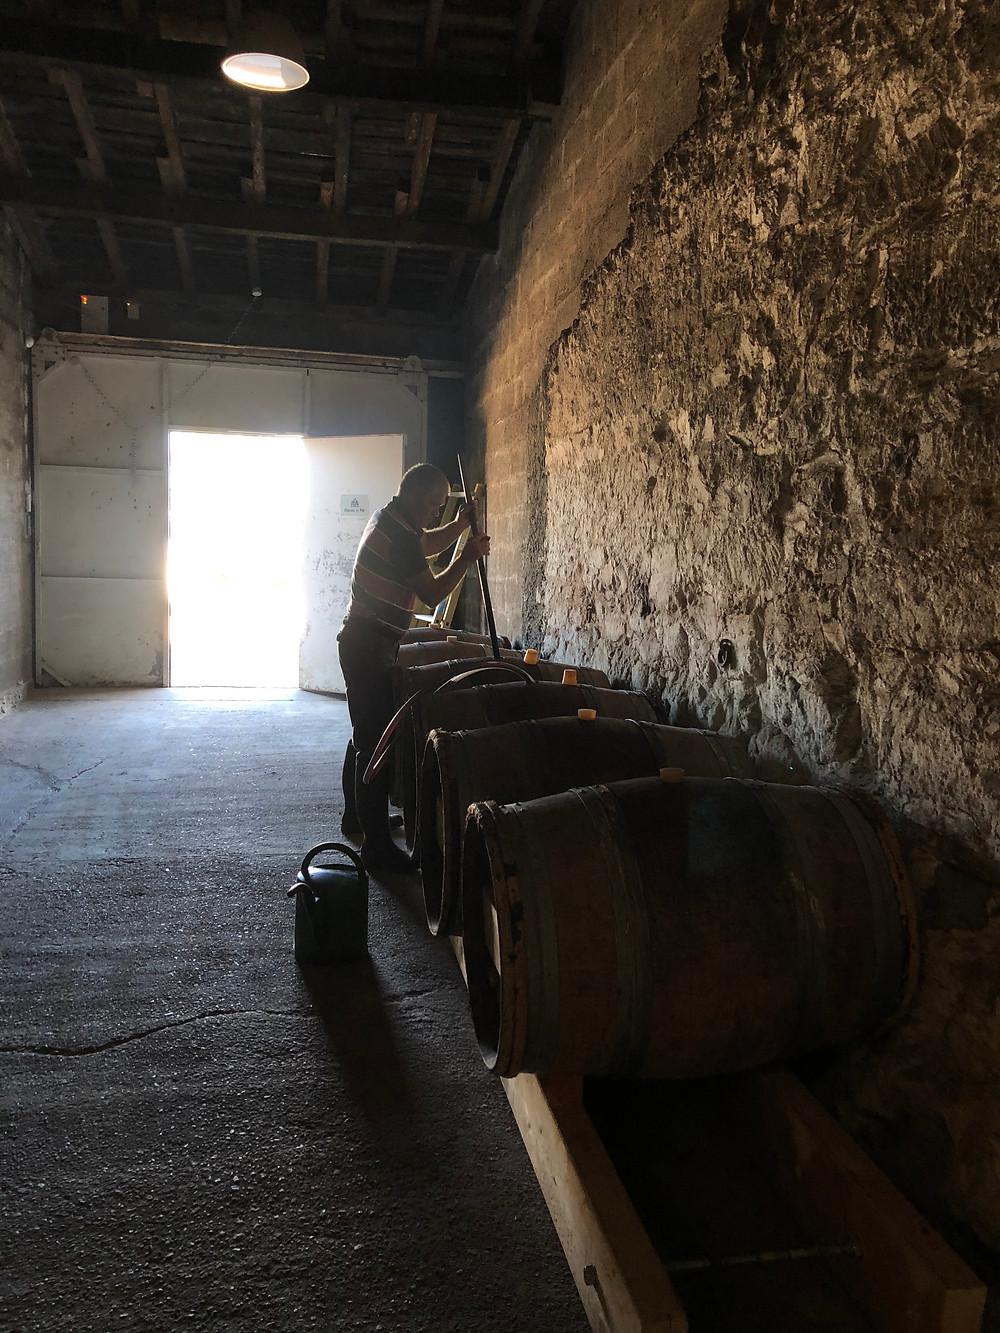 Dynamization in biodynamics in Chateau Le Puy a biodynamic Bordeaux producer from Cotes de Francs